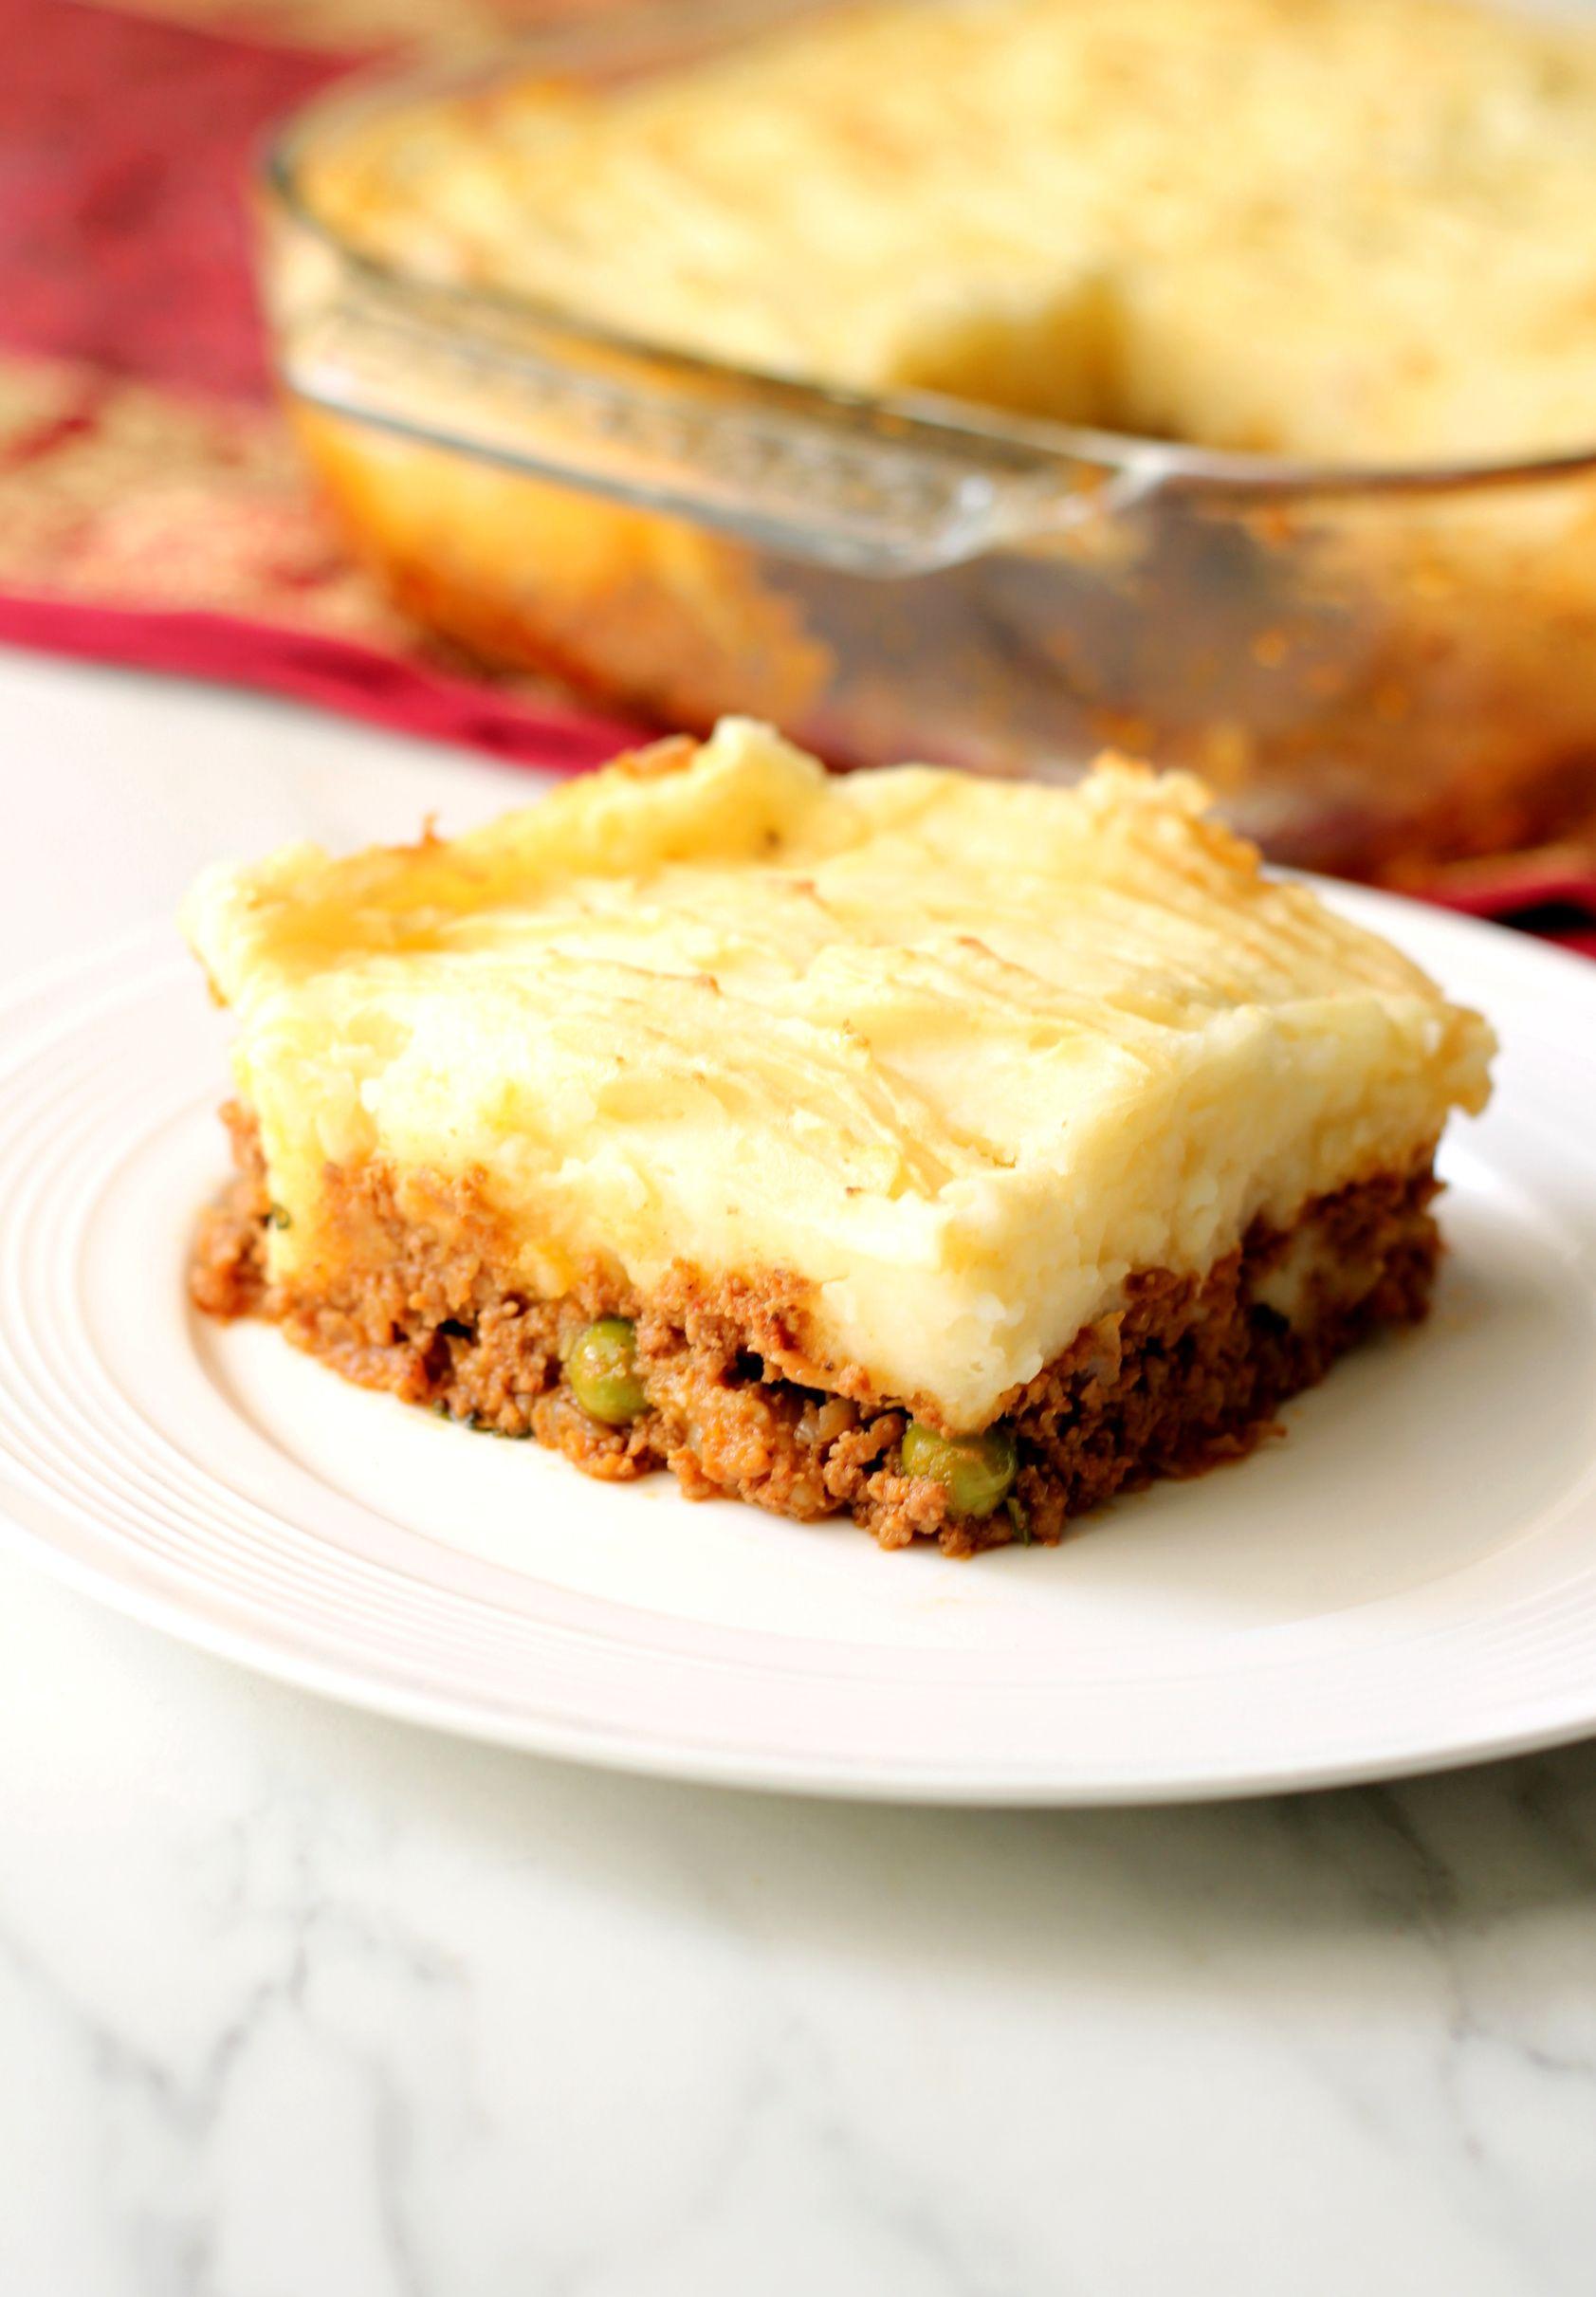 Indian Shepherd S Pie Spiced Cottage Pie Video Ruchik Randhap Recipe In 2020 Cottage Pie Shepherds Pie Shepherd S Pie